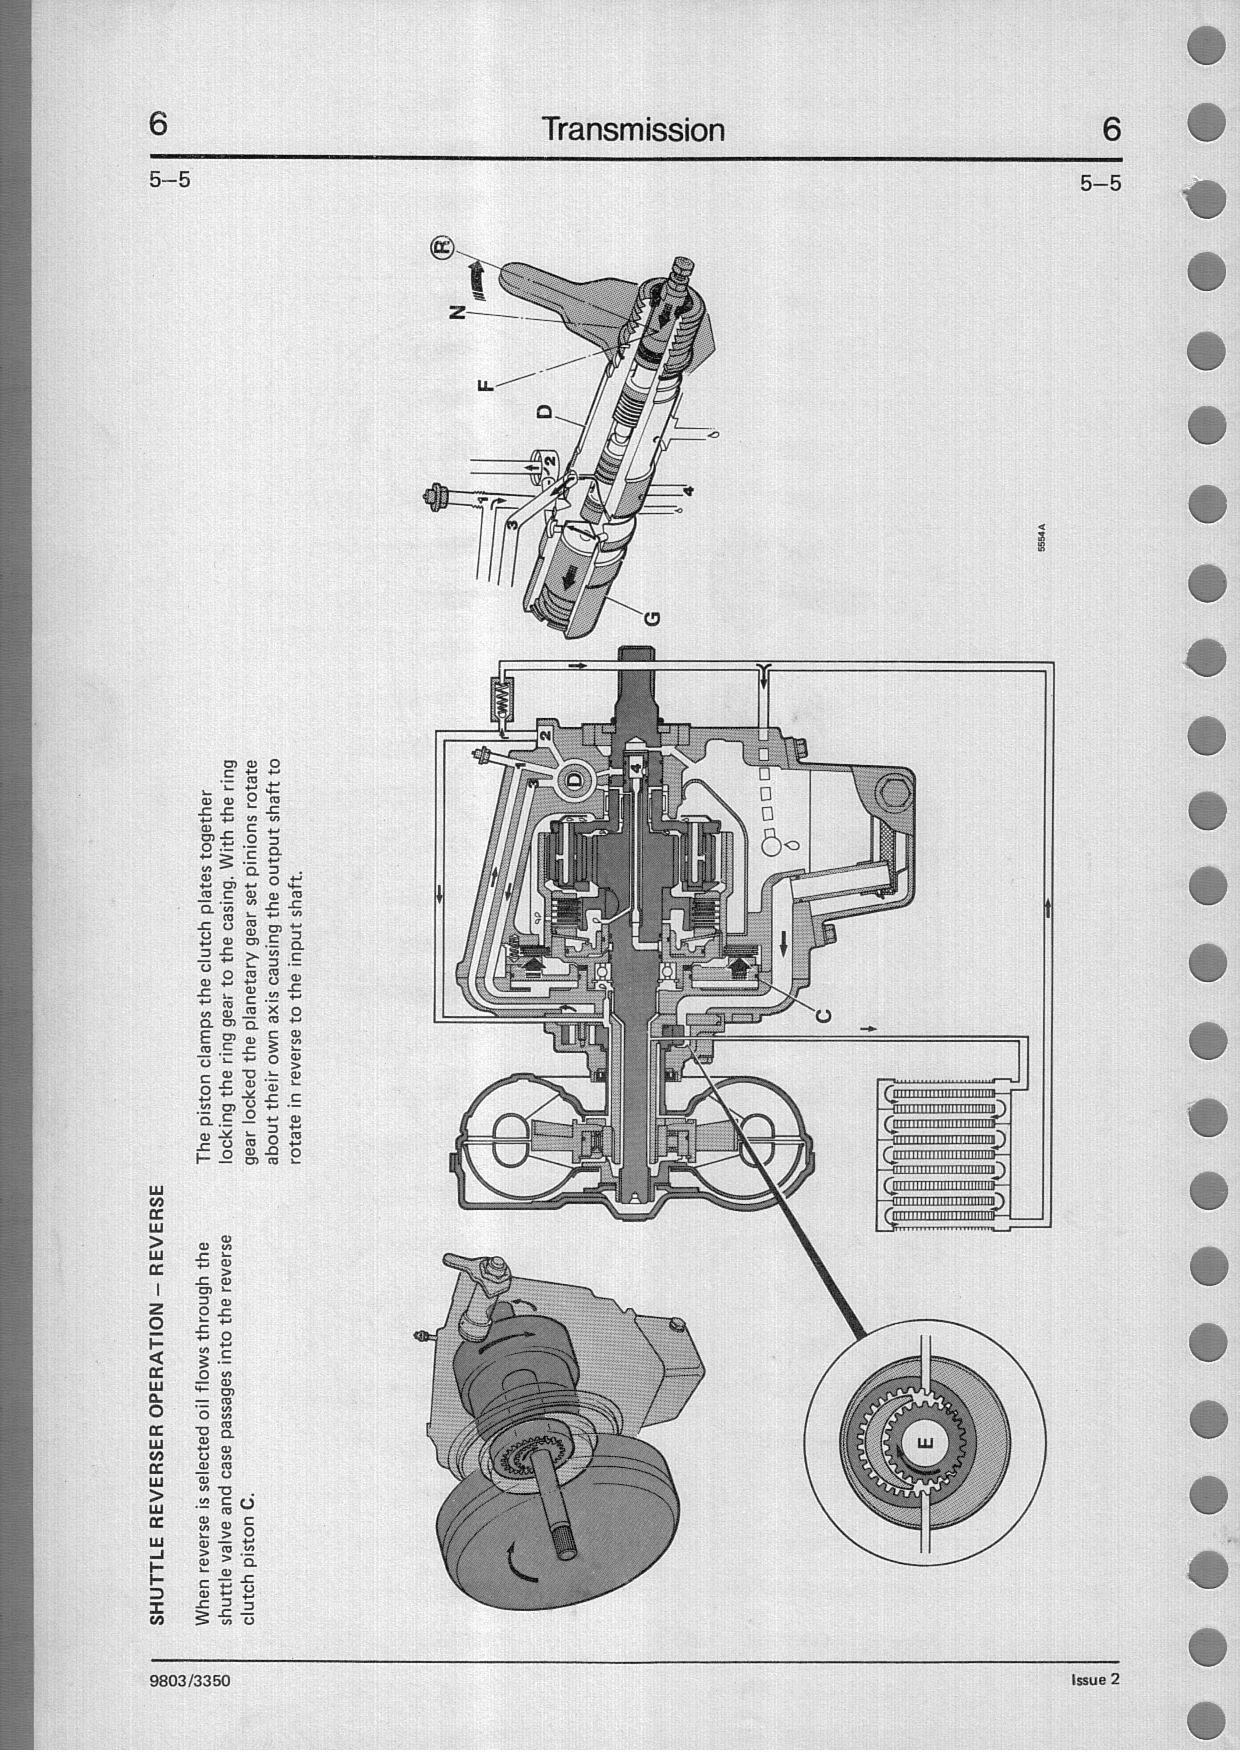 Fine Jcb Ac Wiring Diagram Cat B Wiring Diagram Battery And Wiring Wiring Cloud Overrenstrafr09Org